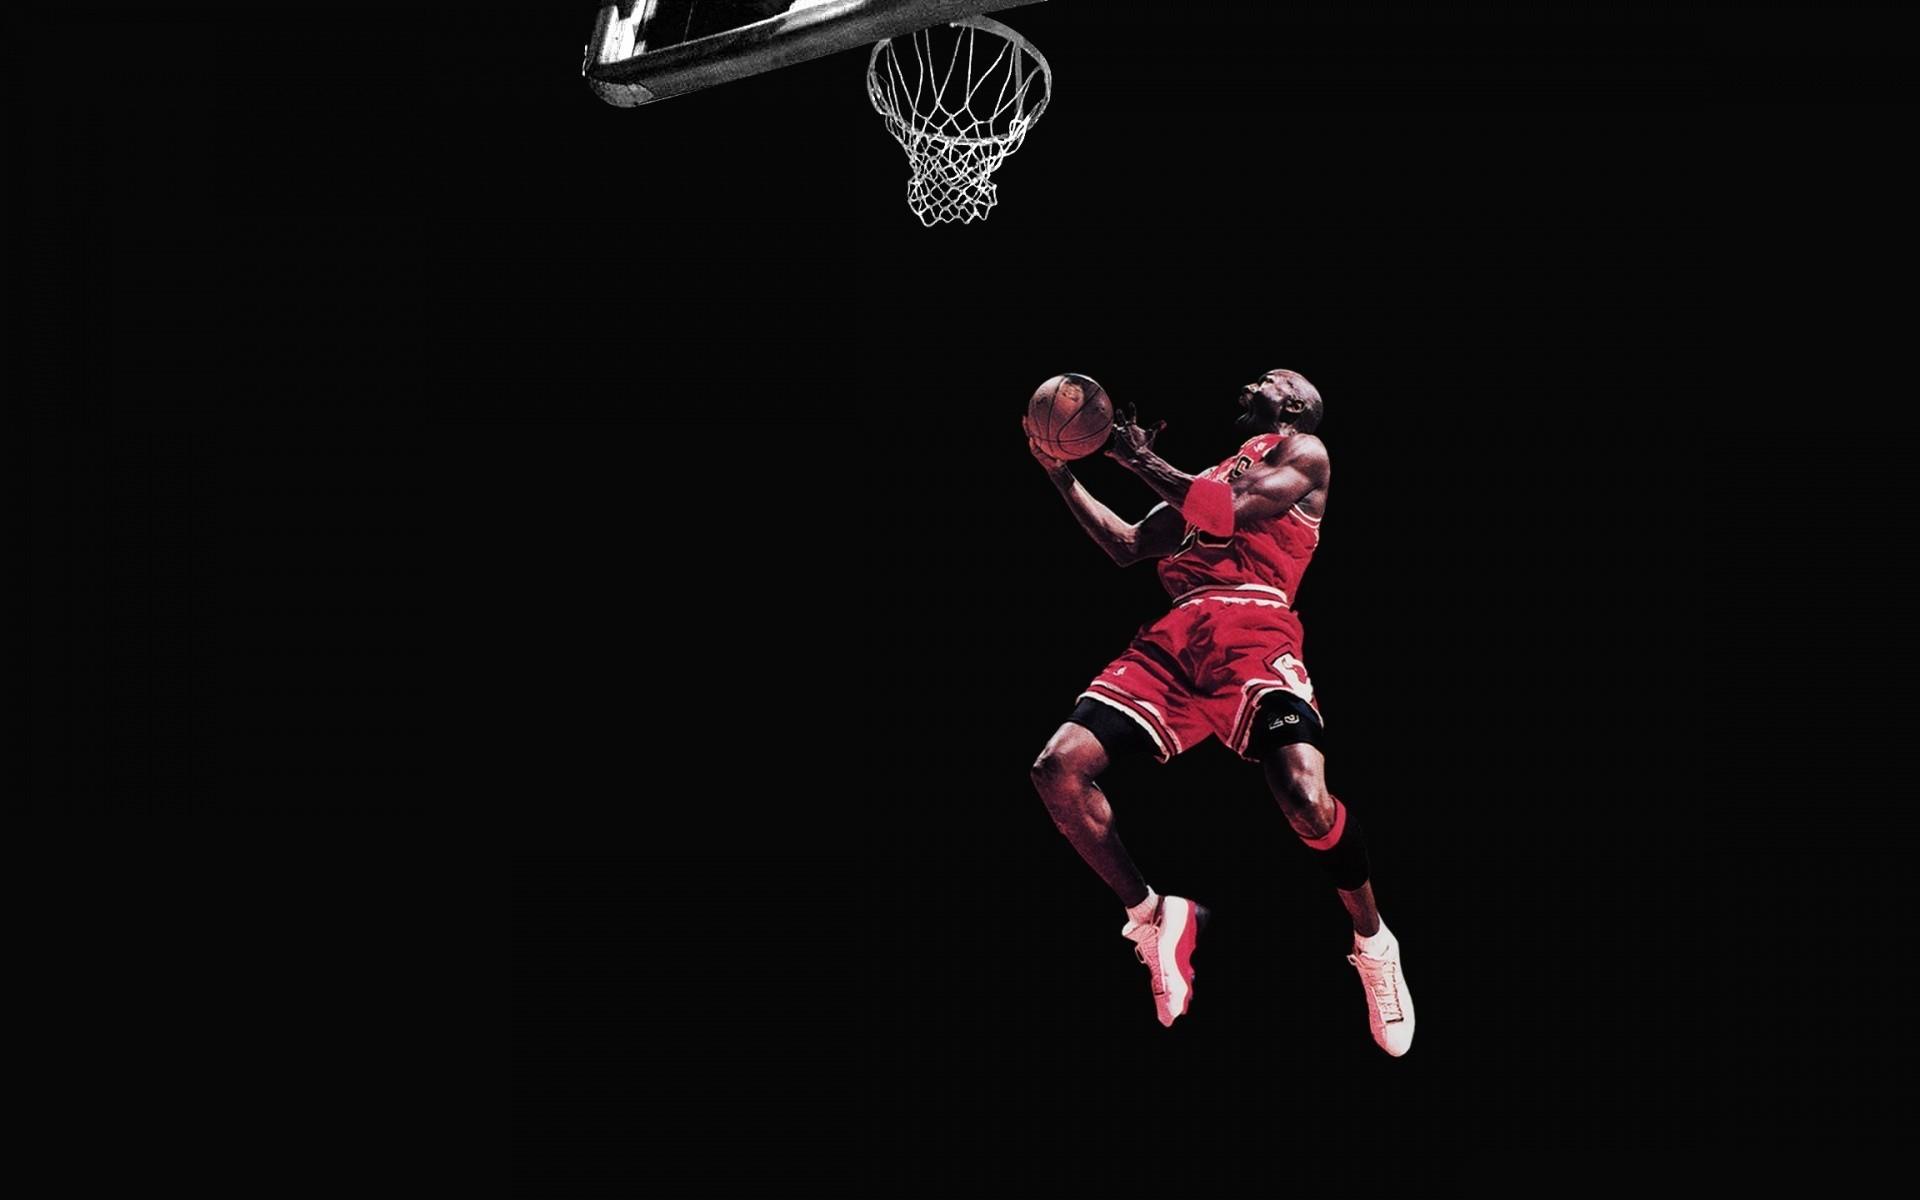 Michael Jordan Chicago Bulls Basketball Jump Black wallpaper .